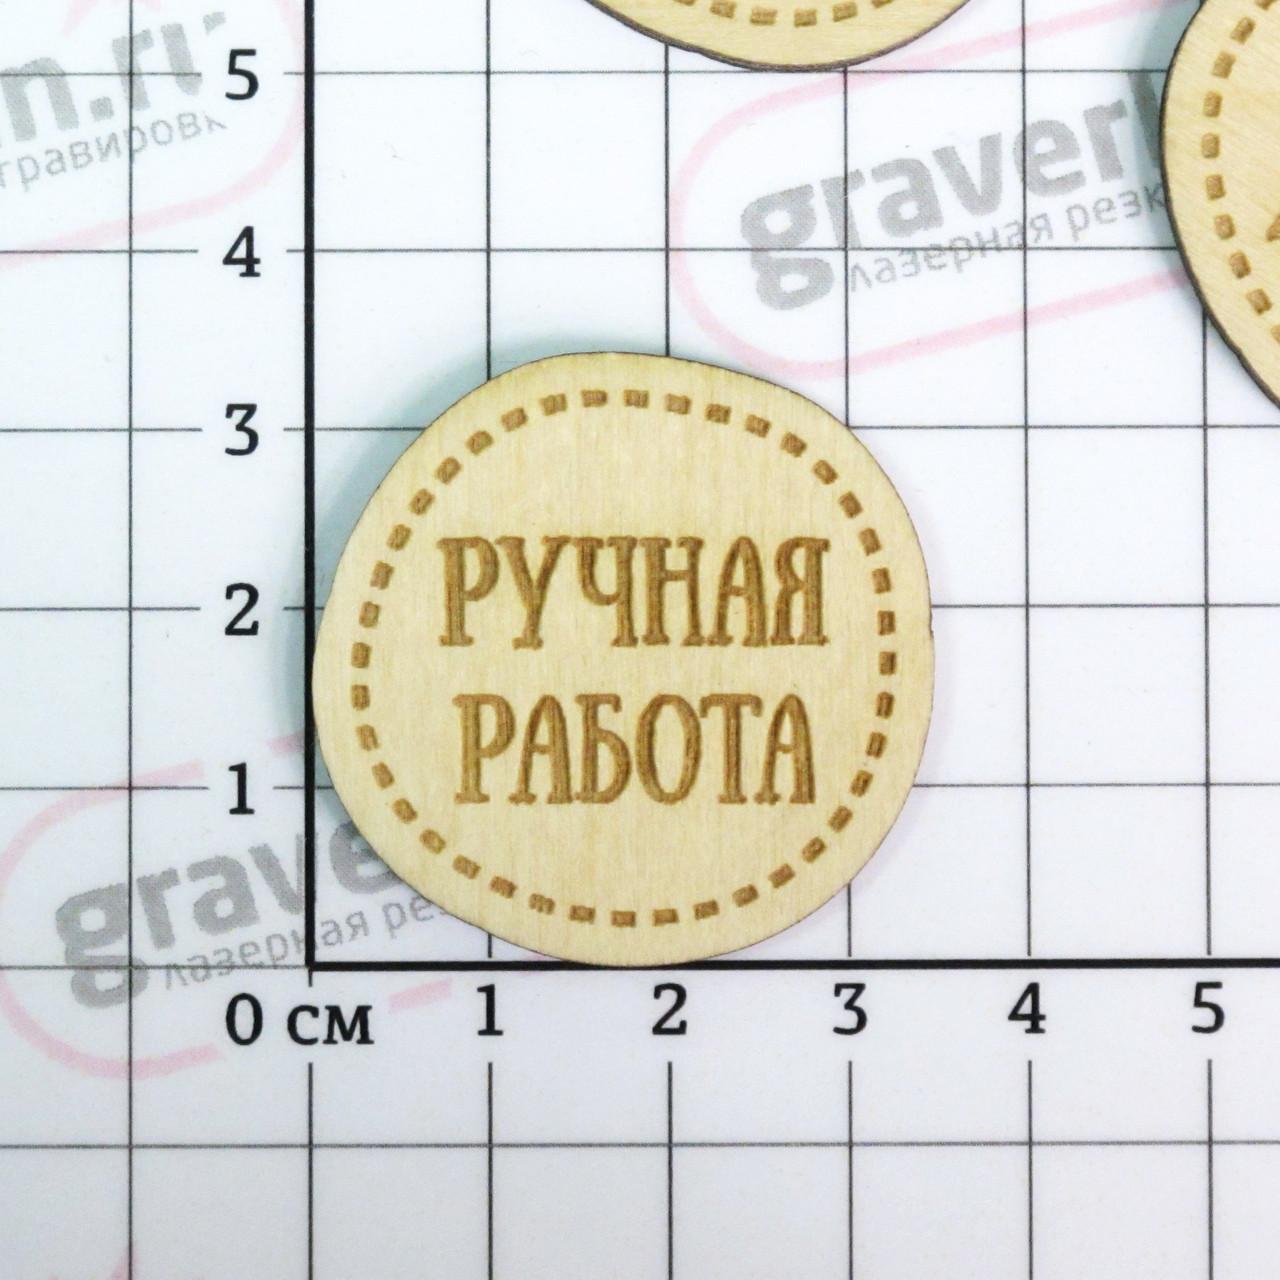 Фурнитура Ручная работа 03